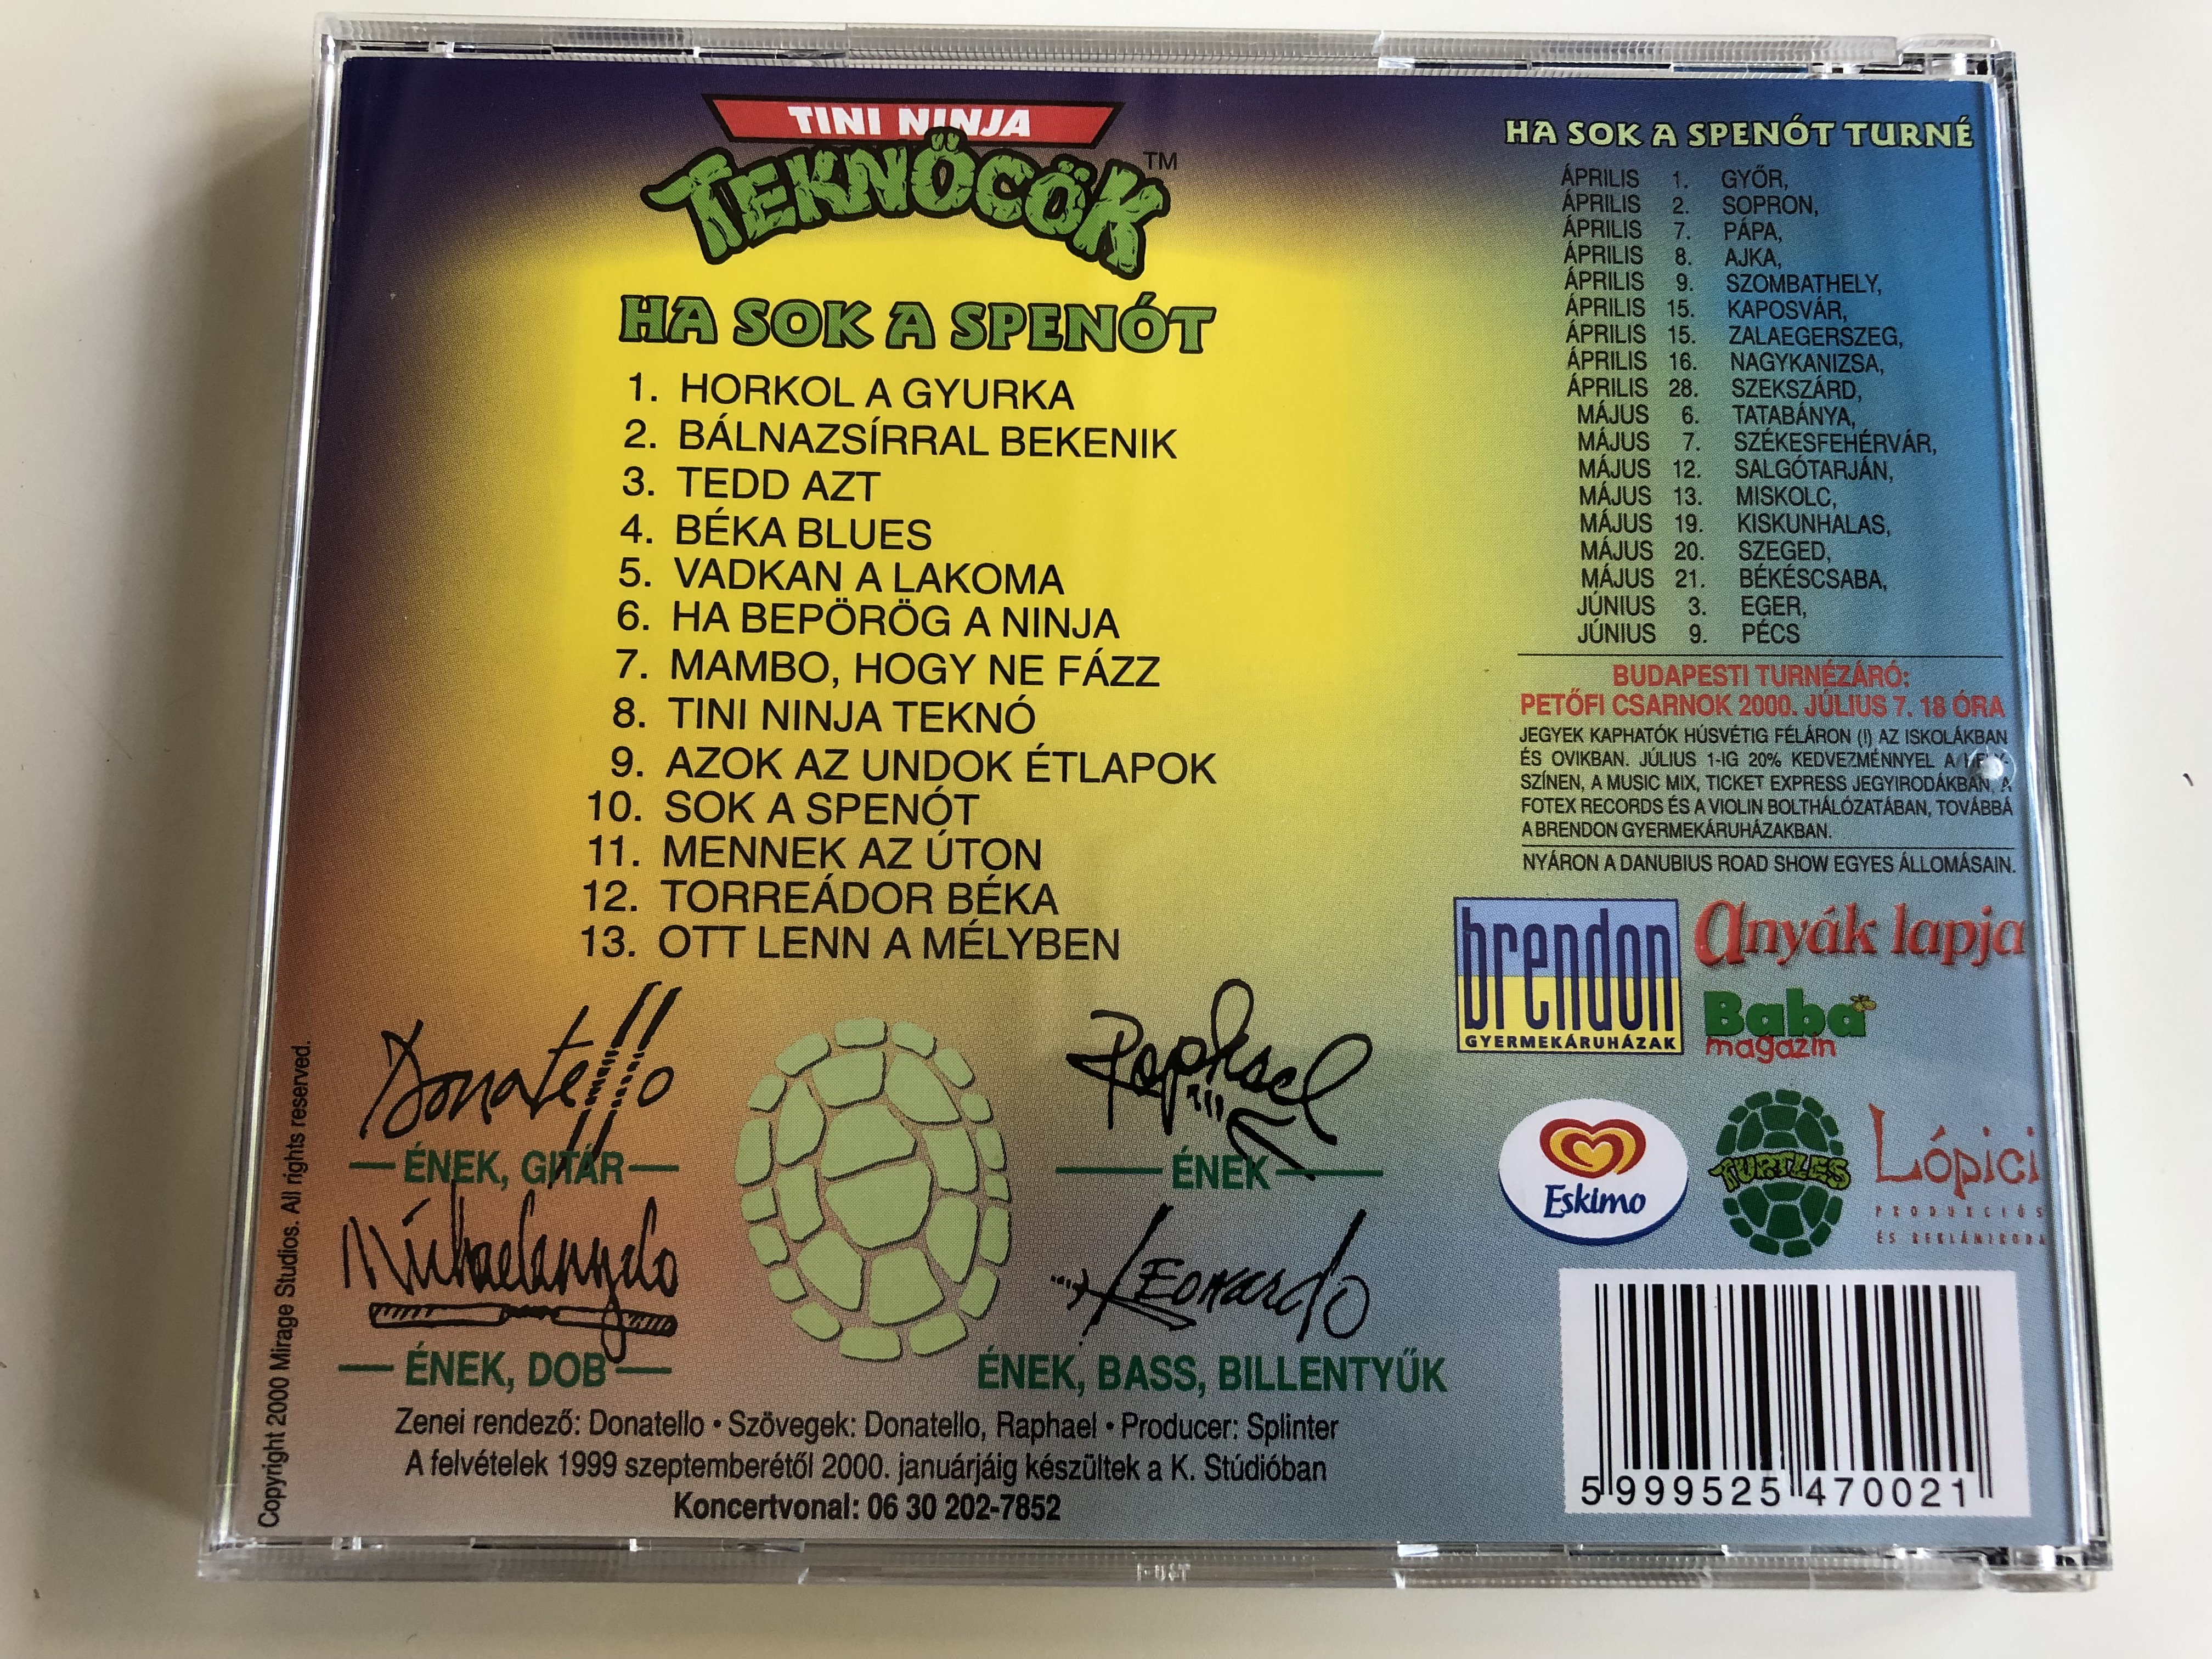 tini-ninja-tekn-c-k-ha-sok-a-spen-t-audio-cd-2000-teenage-mutant-ninja-turtles-music-cd-in-hungarian-6-.jpg